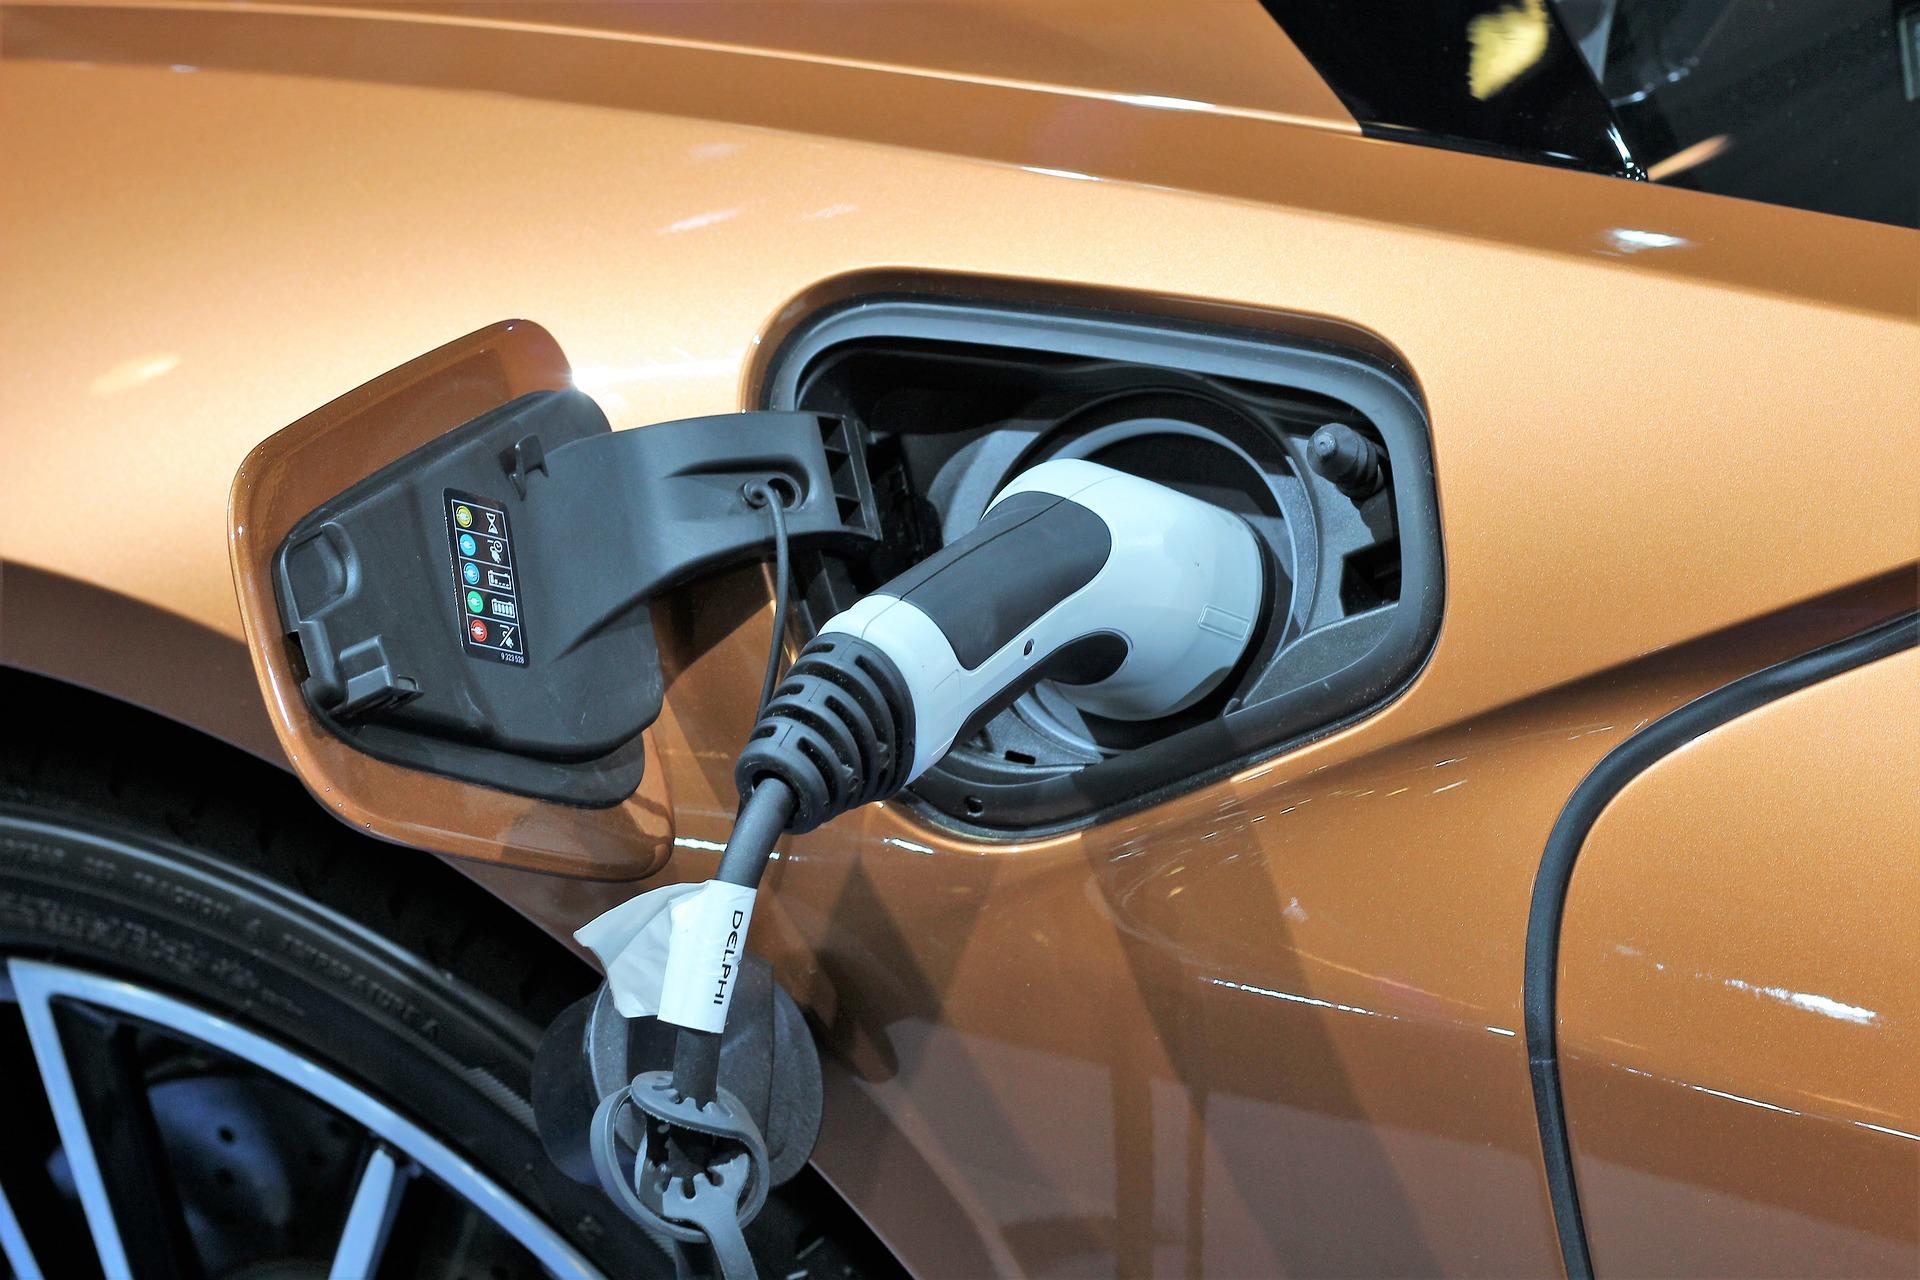 Ecobonus veicoli 2020